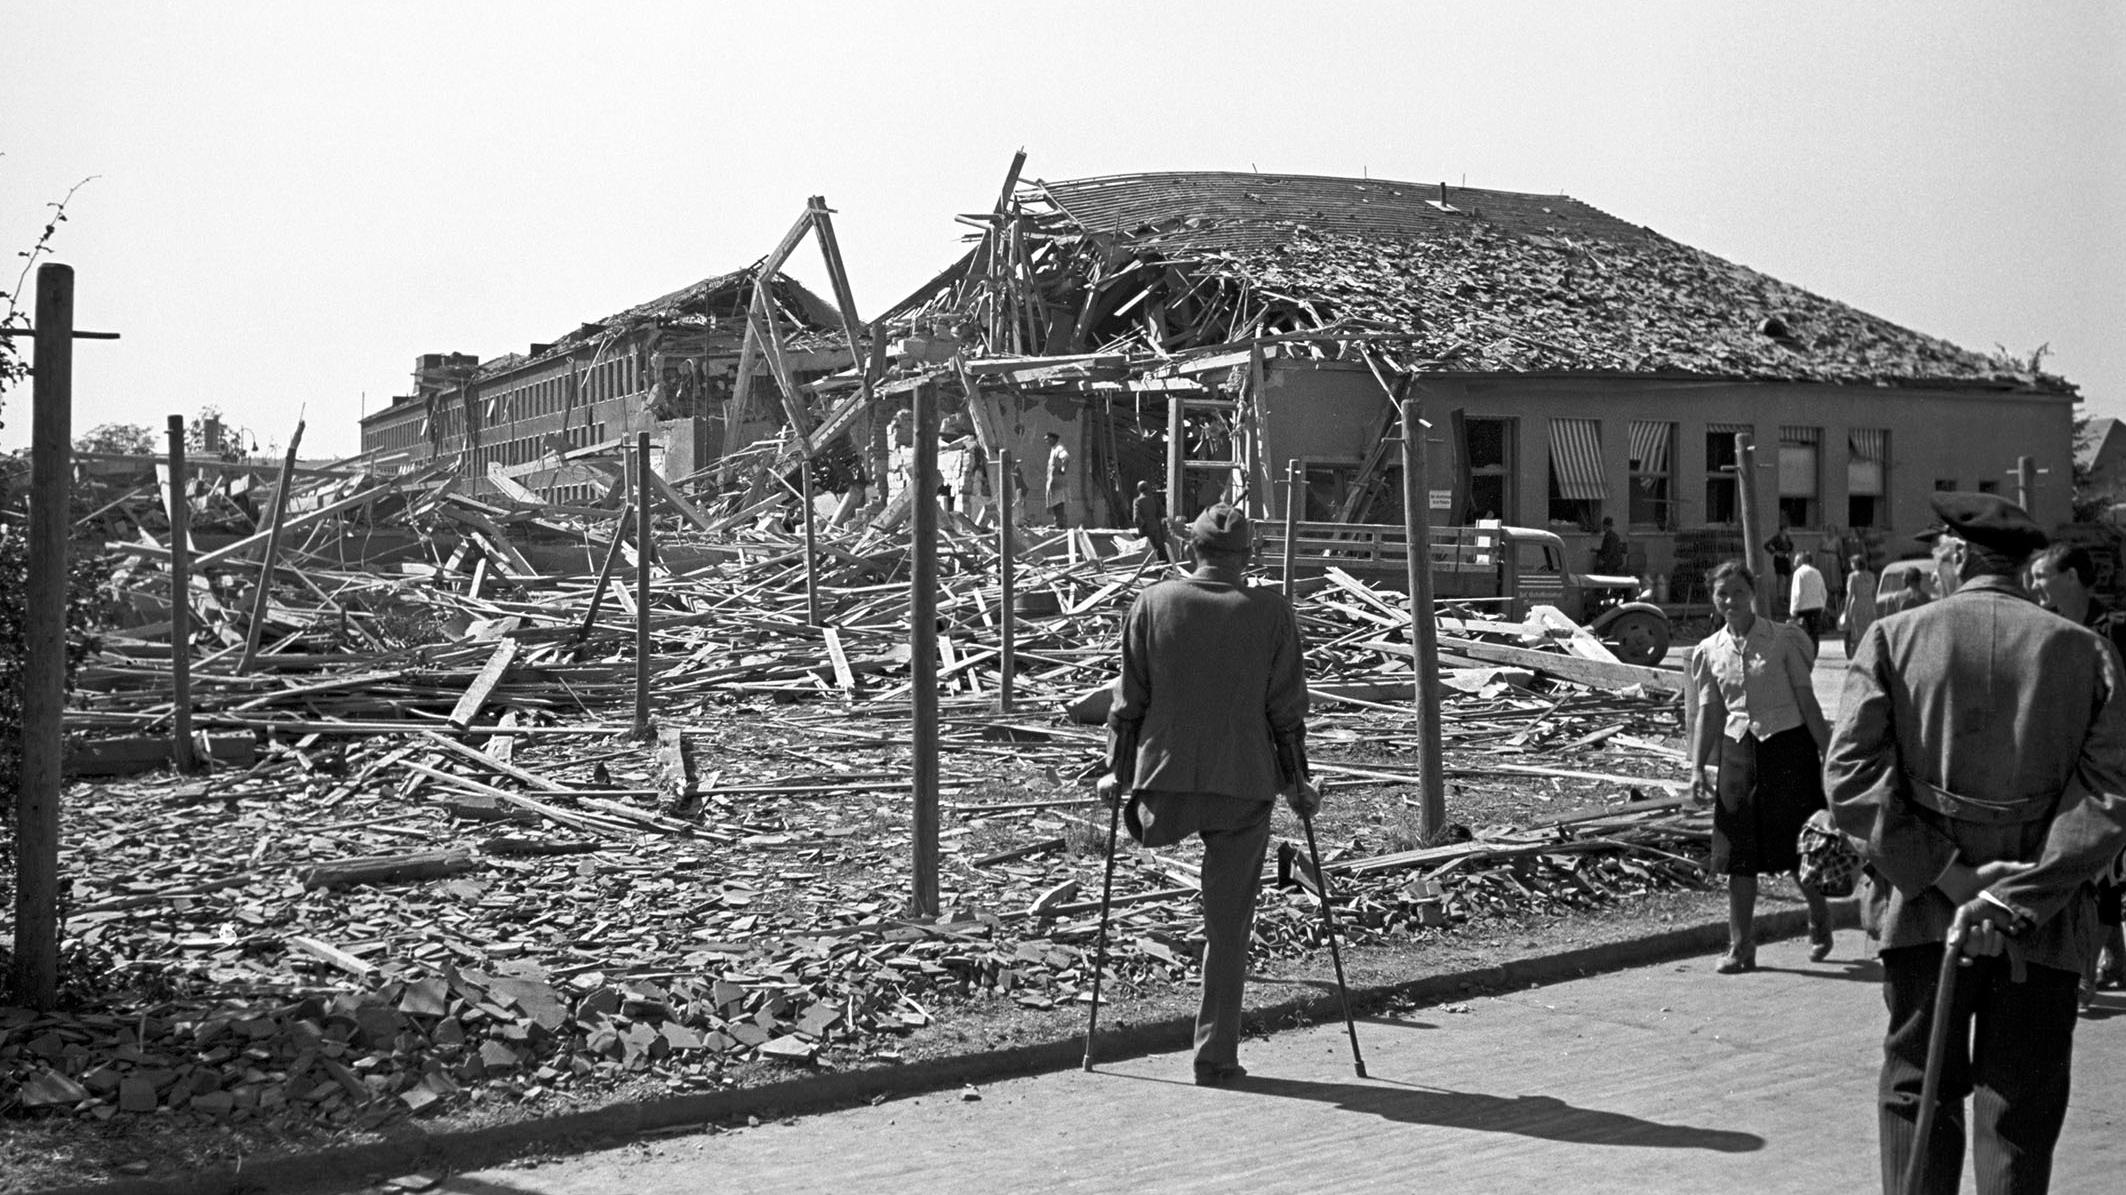 Das völlig zerstörte Messerschmitt-Werk